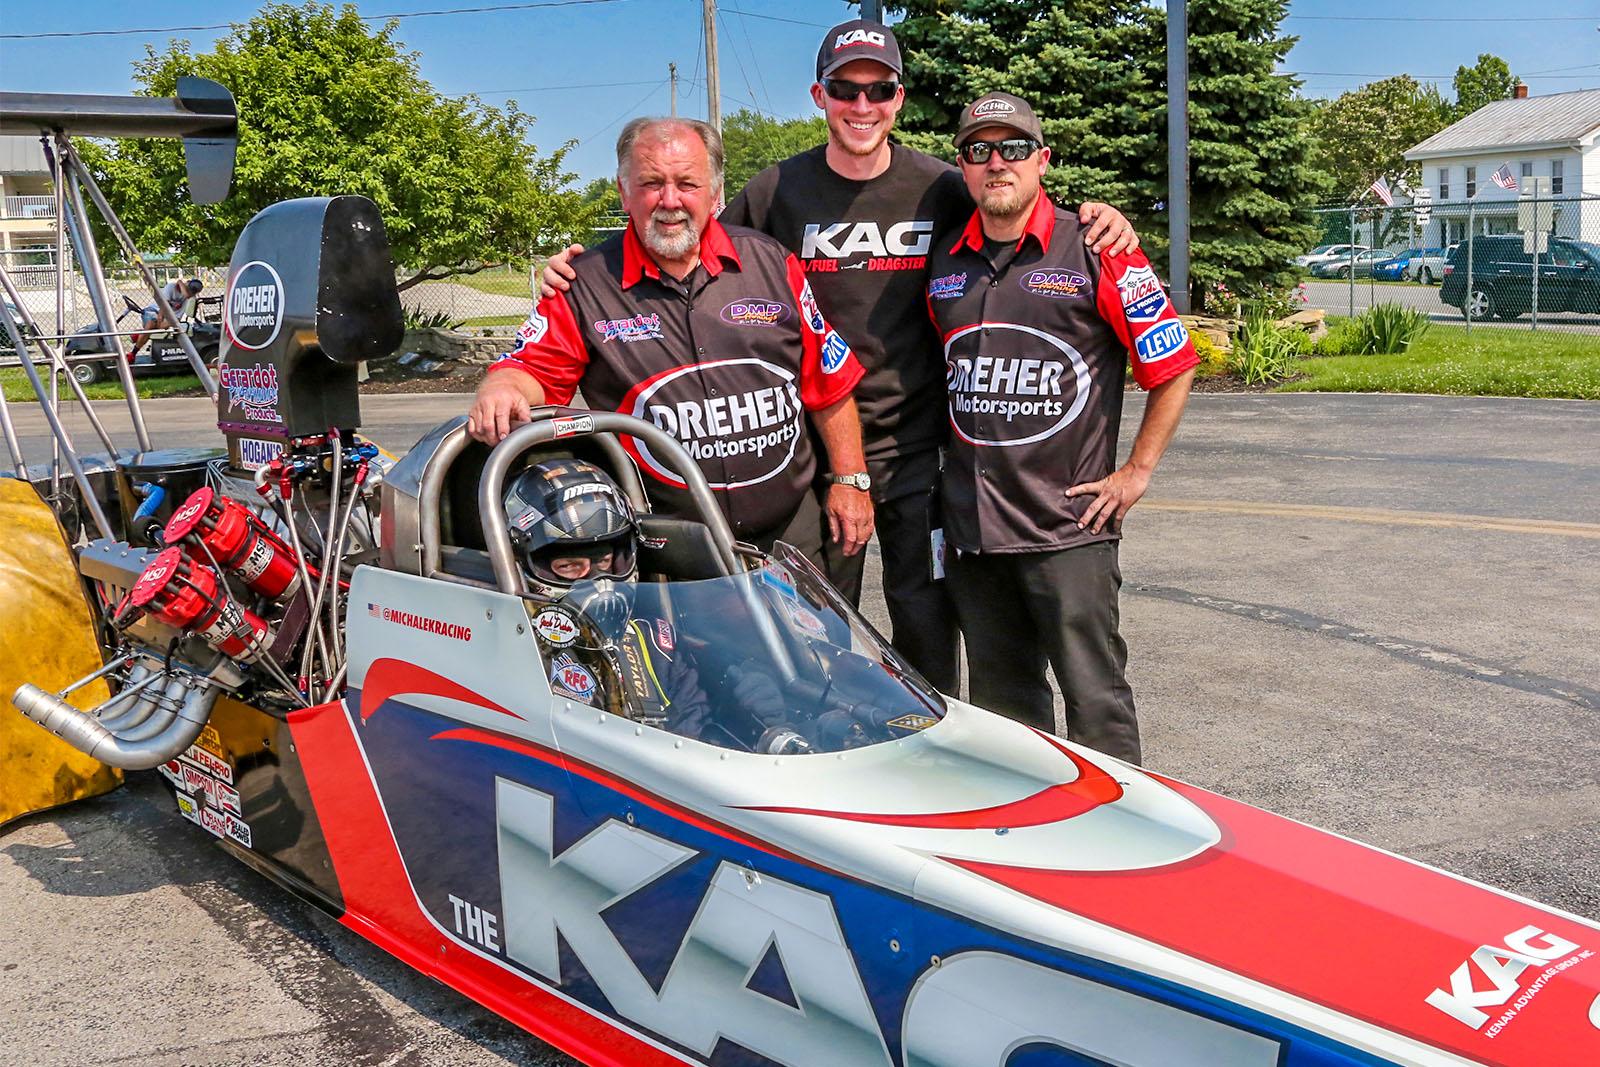 The Michalek Brothers Racing and Dreher Motorsports teammates: Randy Dreher, Kyle Michalek, Jared Dreher, and Corey Michalek.